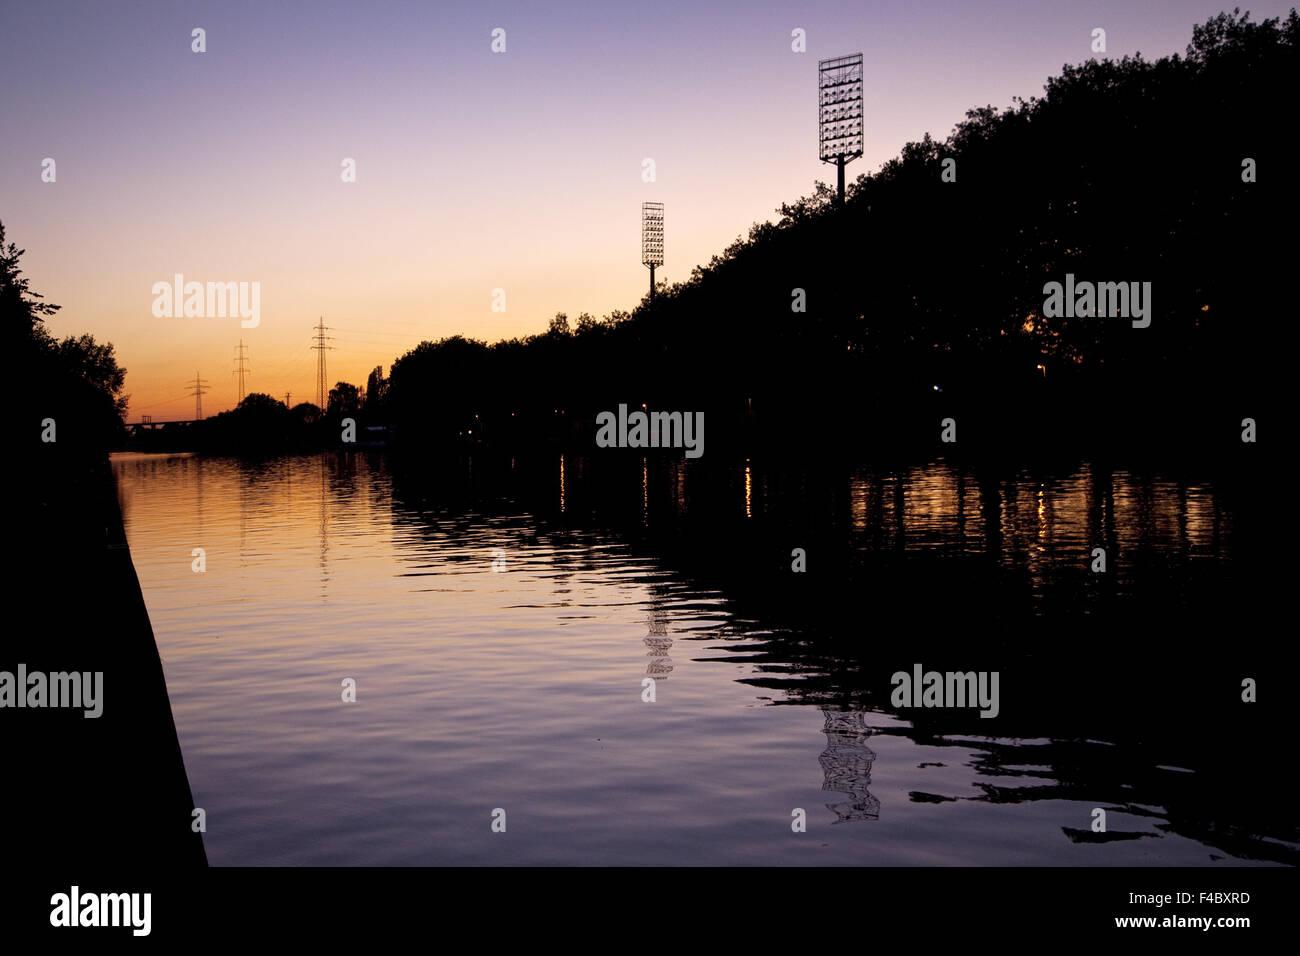 Rhine Herne canal, Oberhausen, Germany - Stock Image